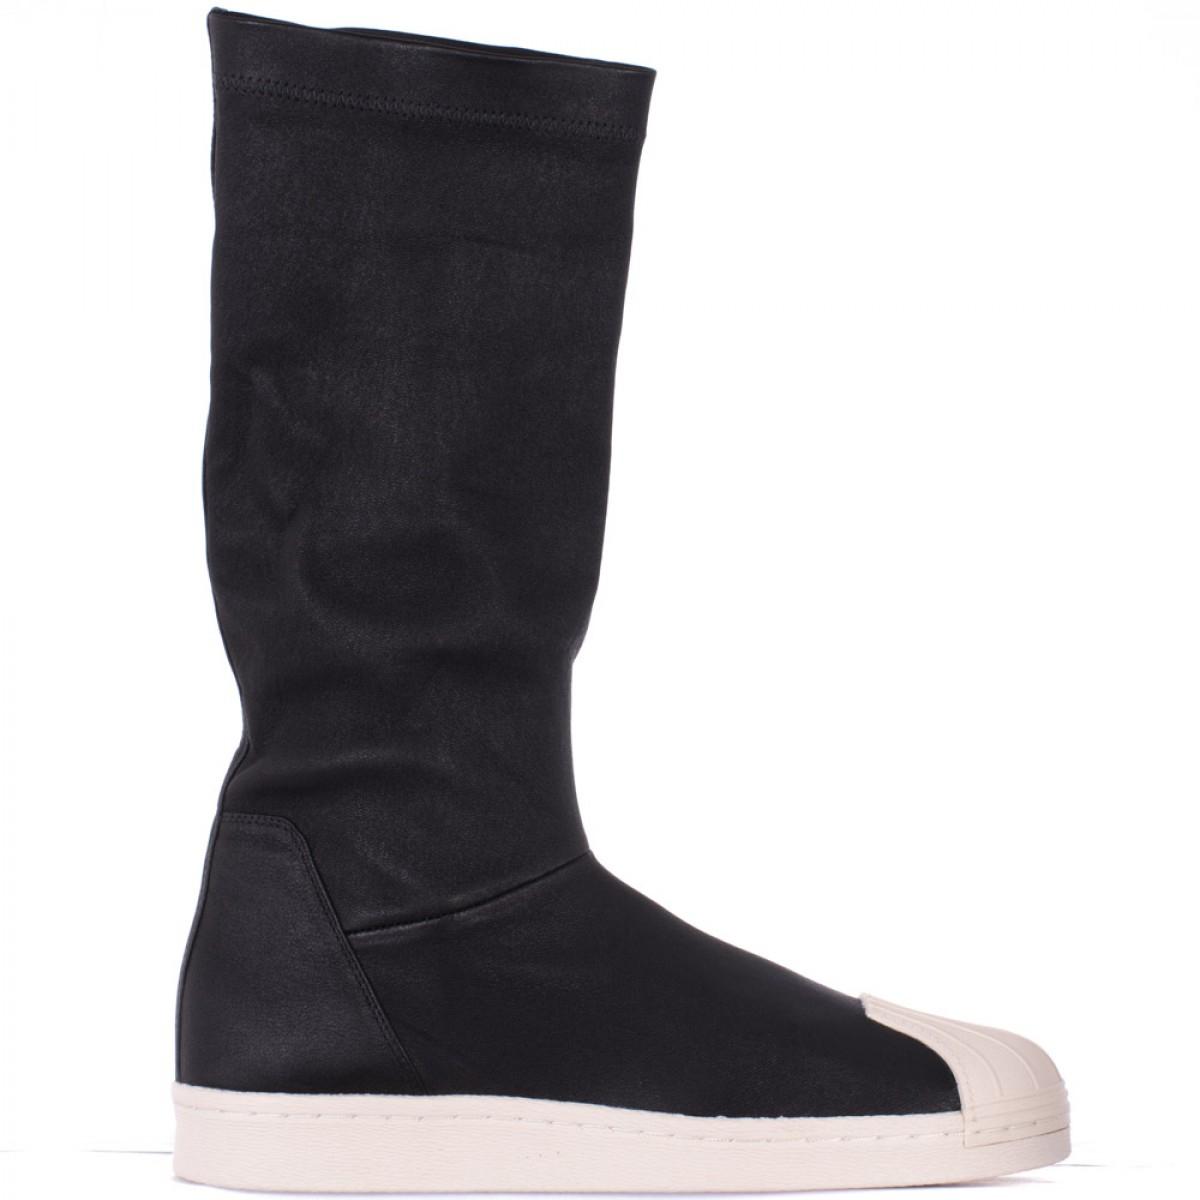 rick owens adidas superstar goatskin boots in black lyst. Black Bedroom Furniture Sets. Home Design Ideas